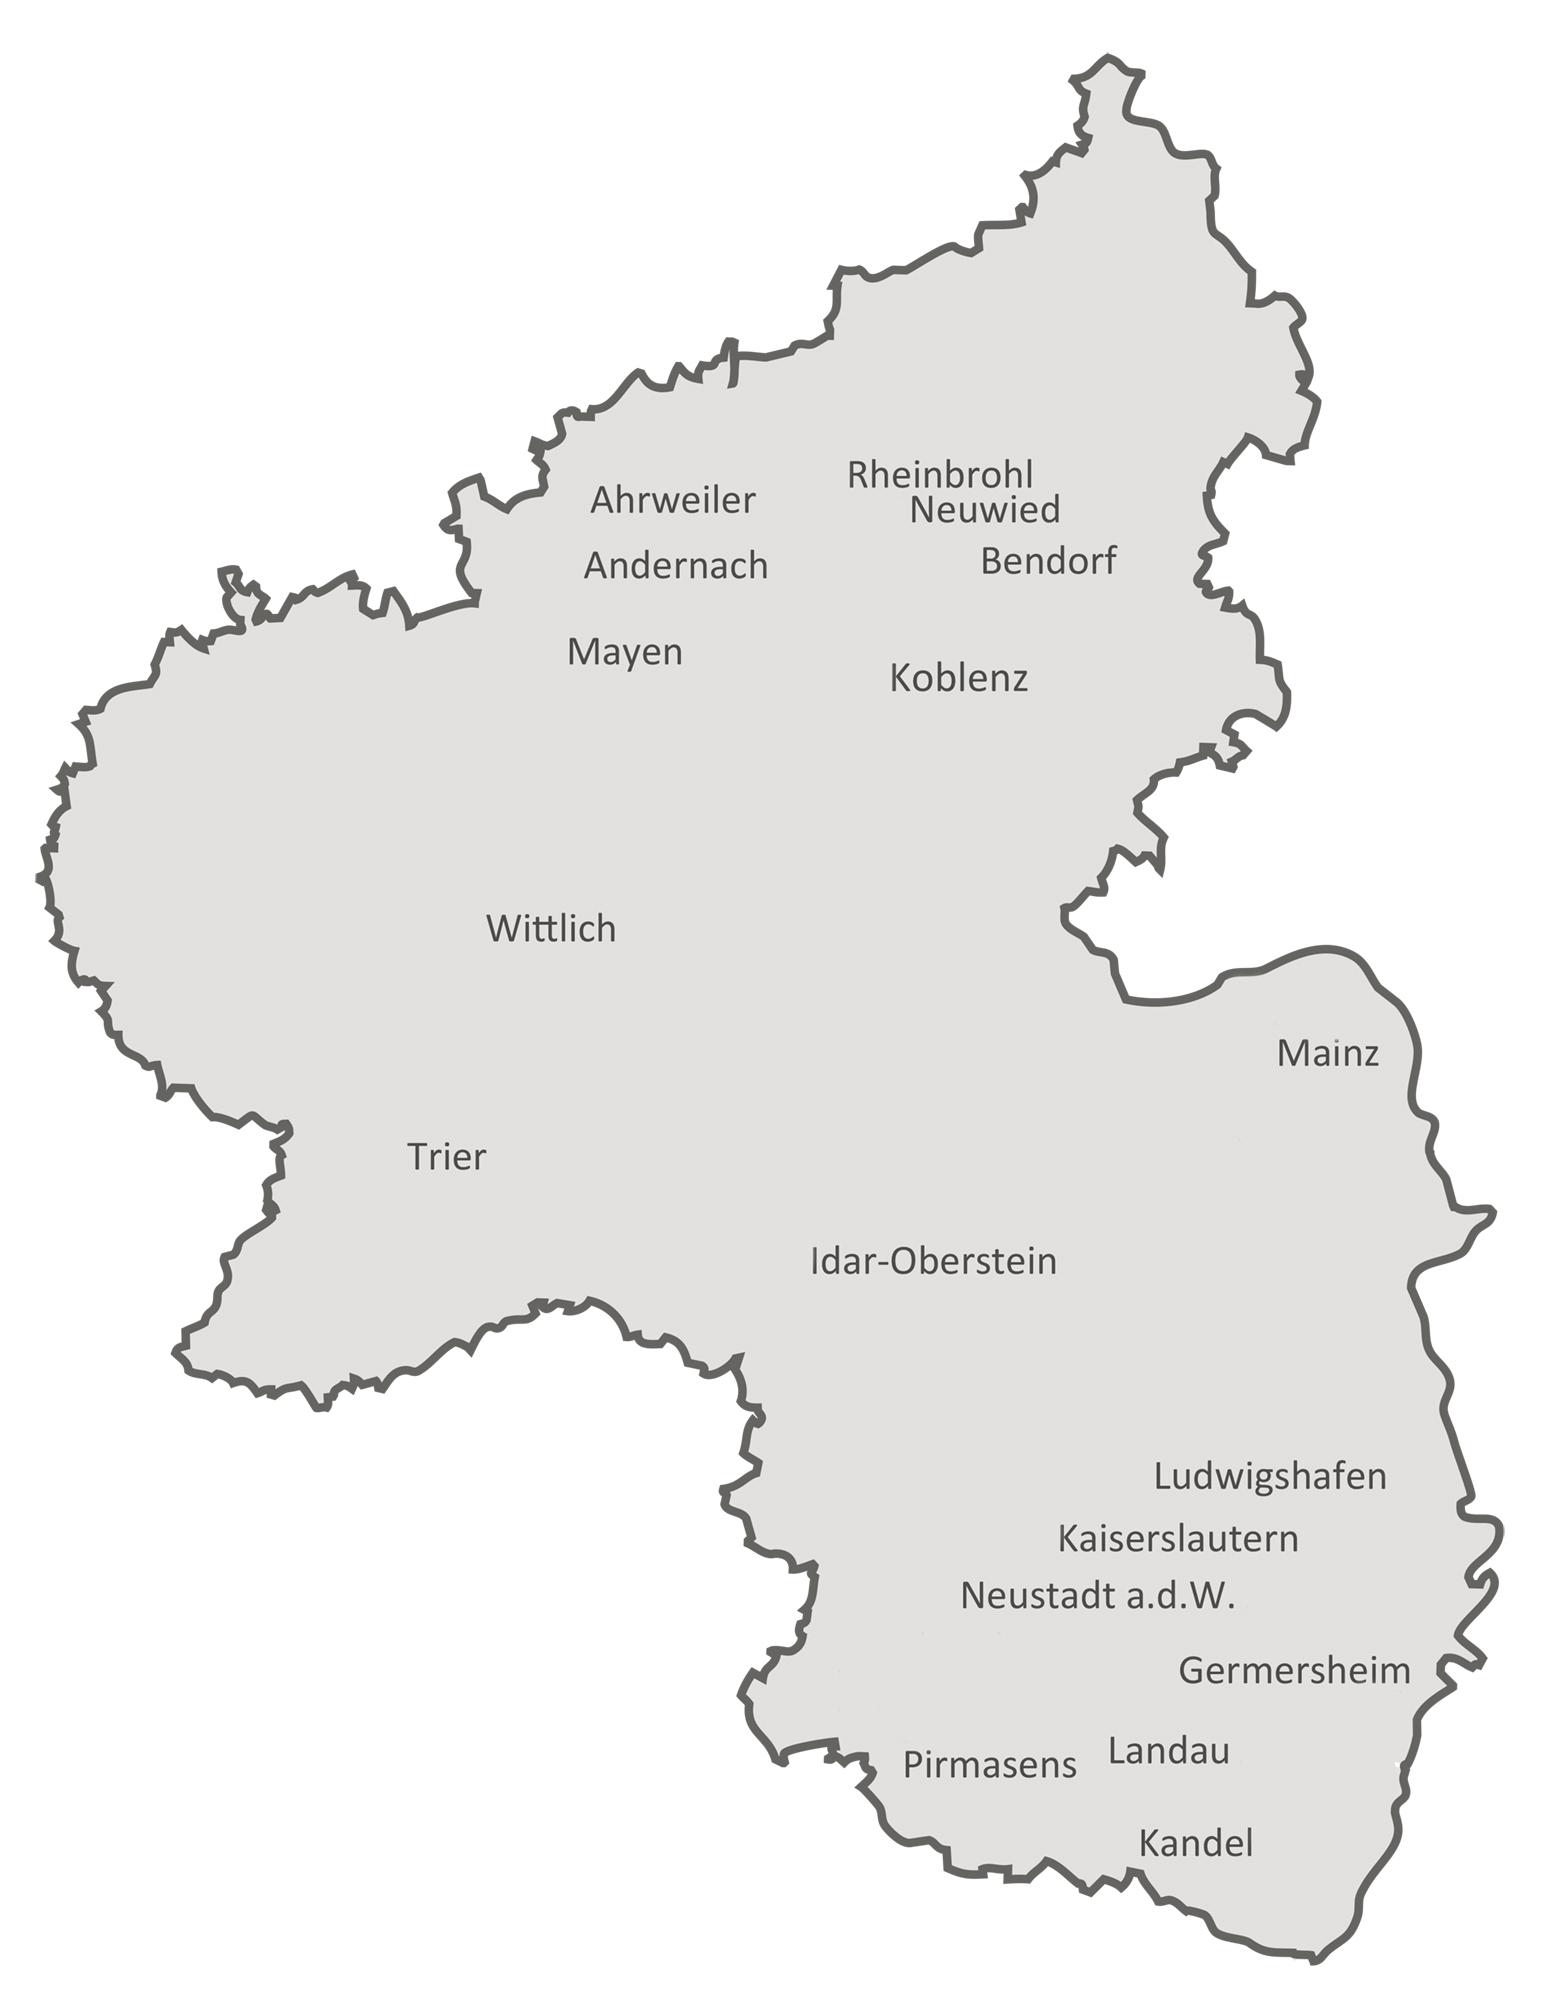 Jugendherbergen Rheinland Pfalz Saarland Mosel Eifel Rhein